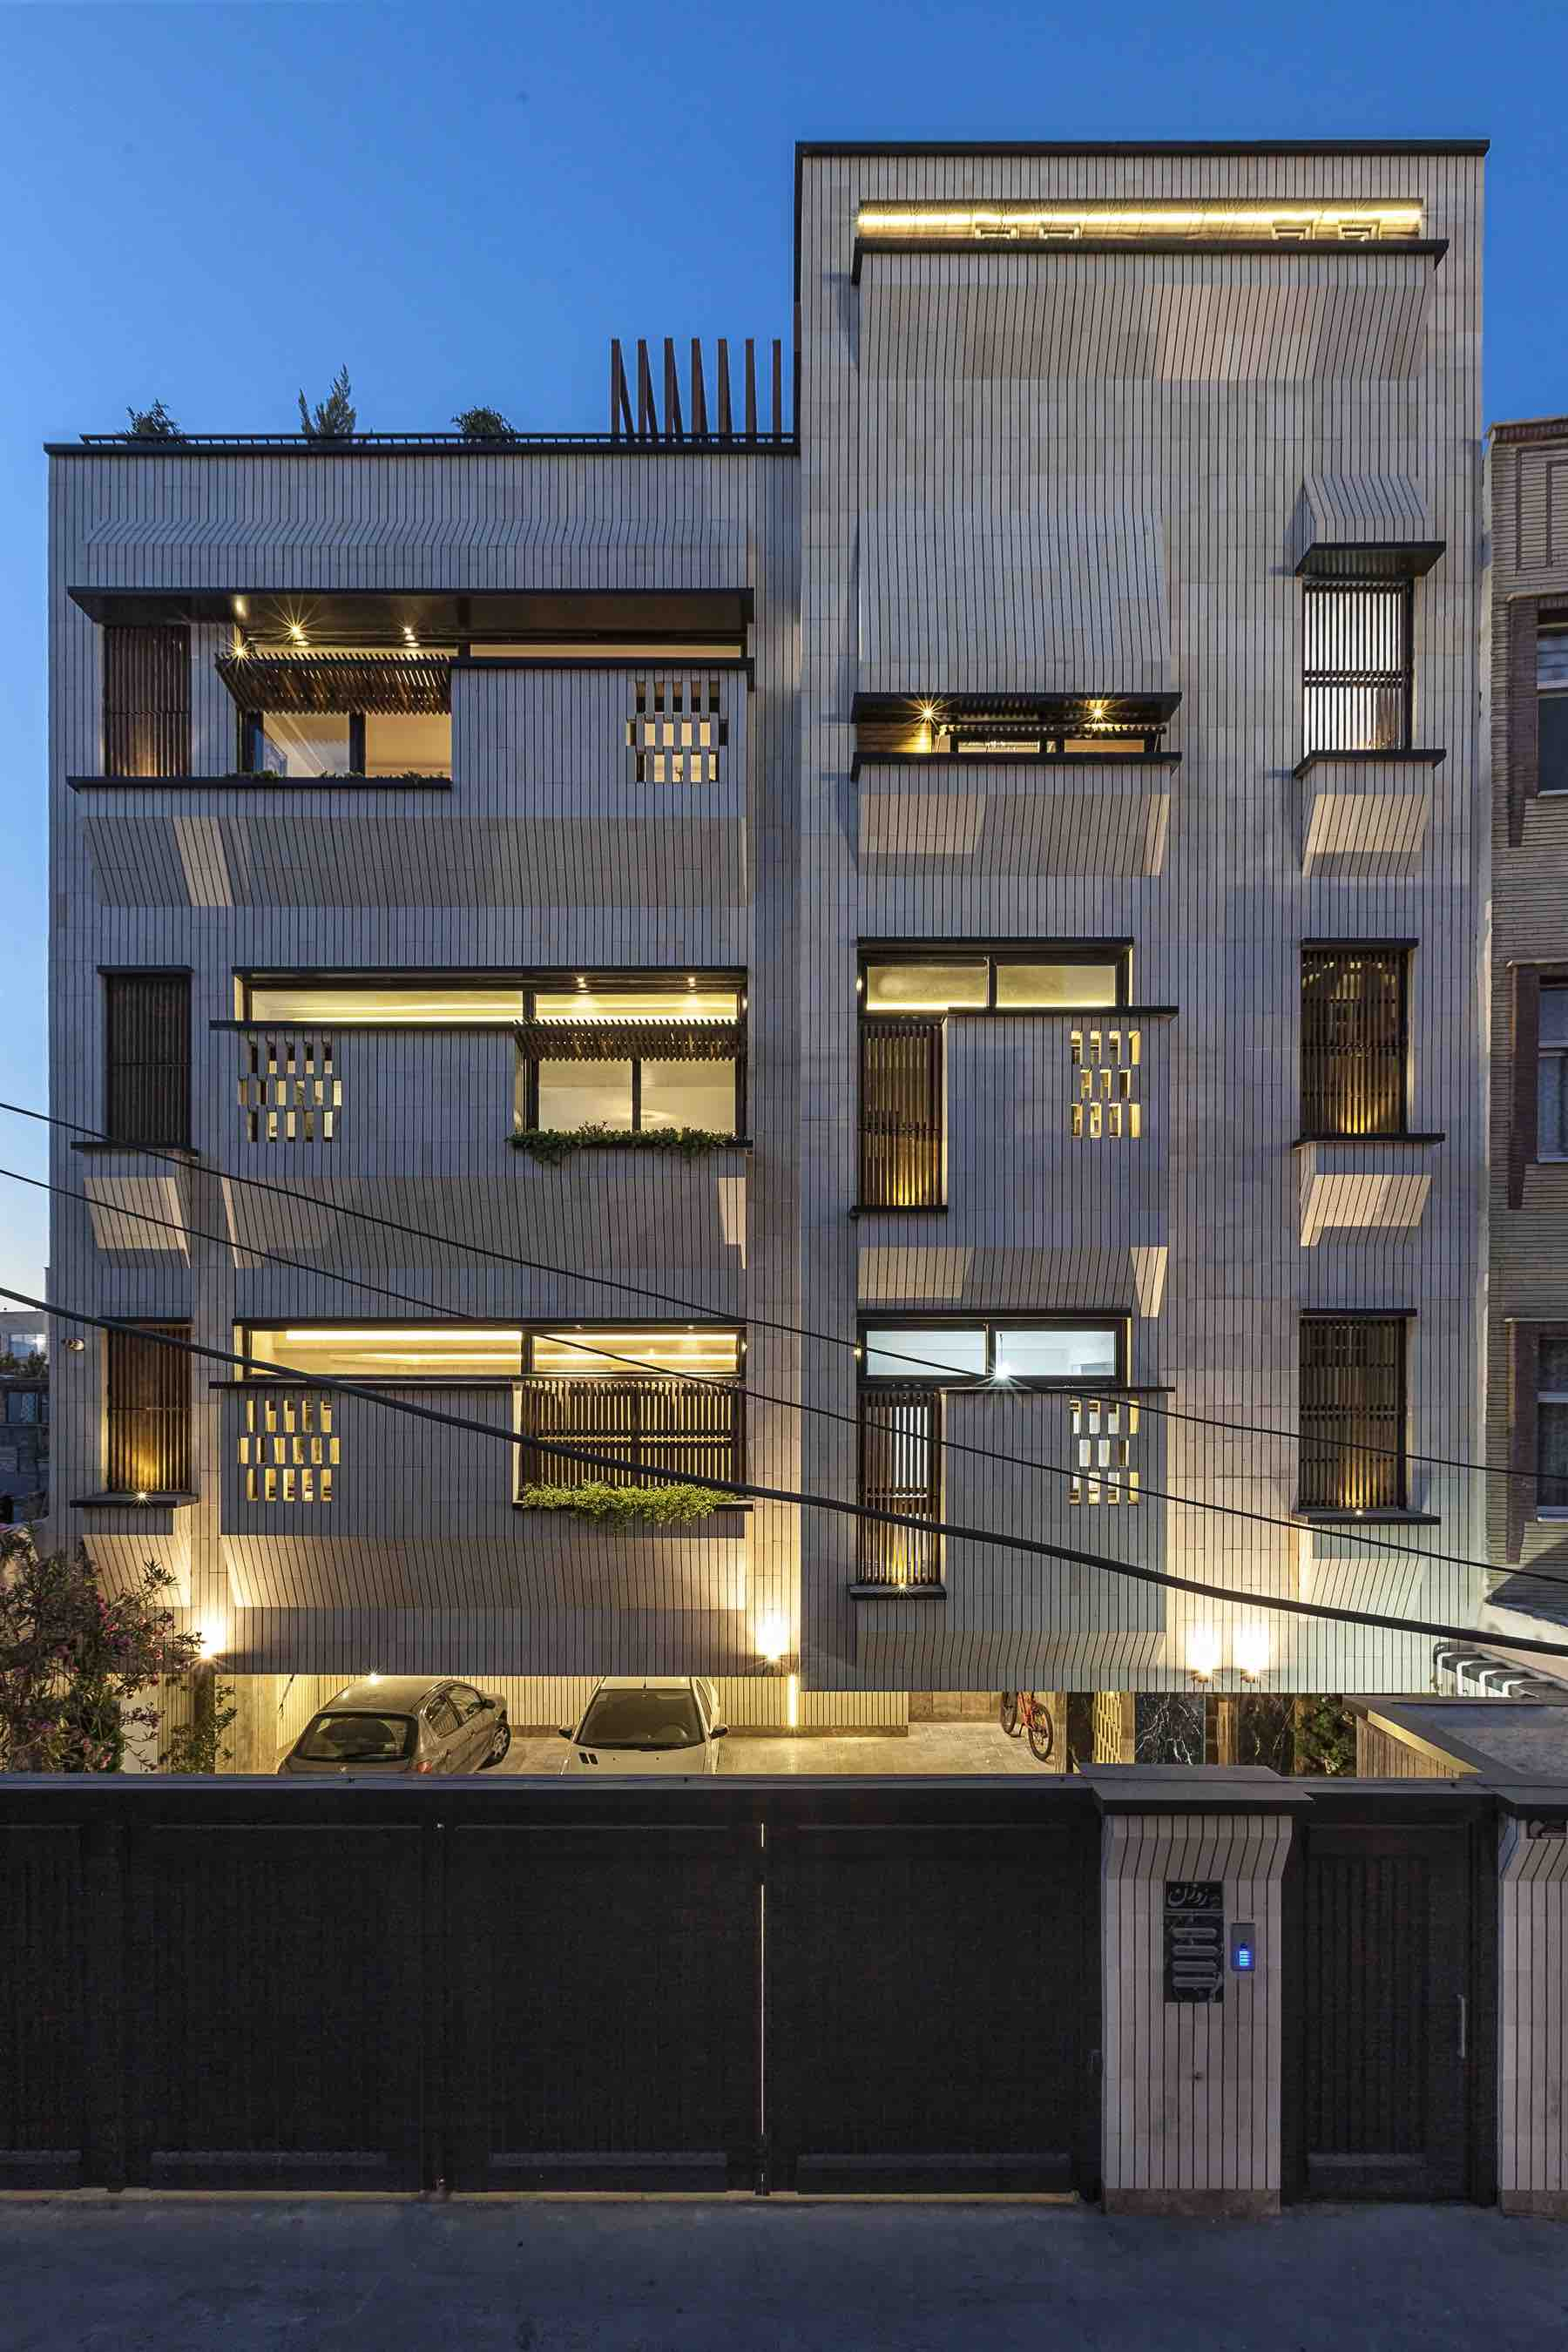 Rouzan_Residential_Building_Sayed_hamed_jafari_Charchoob_Architecture_Office_003.jpg